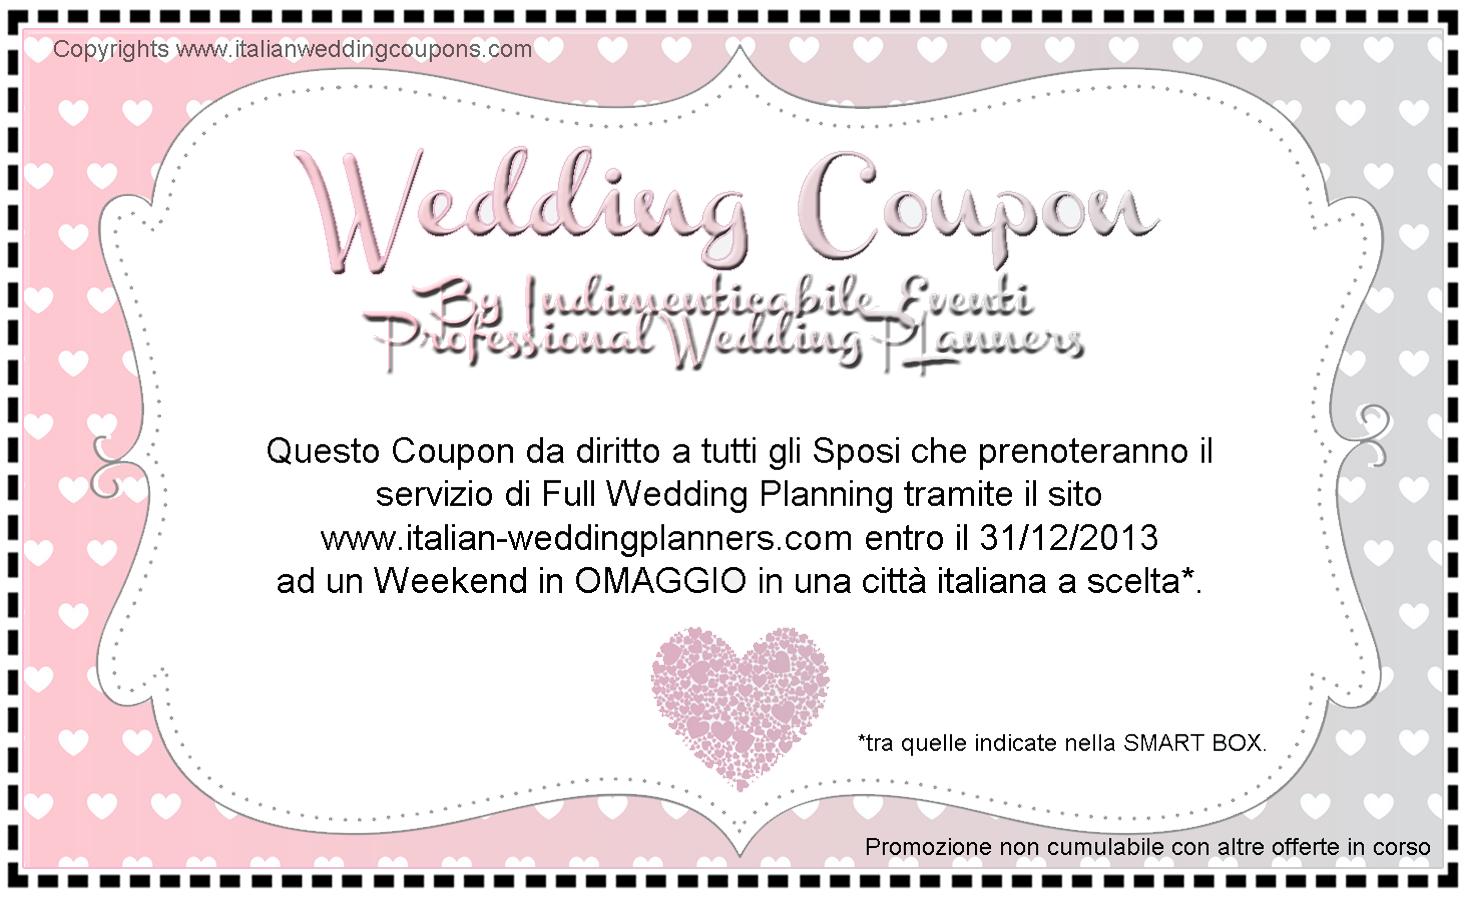 Bride Wedding Coupons 78